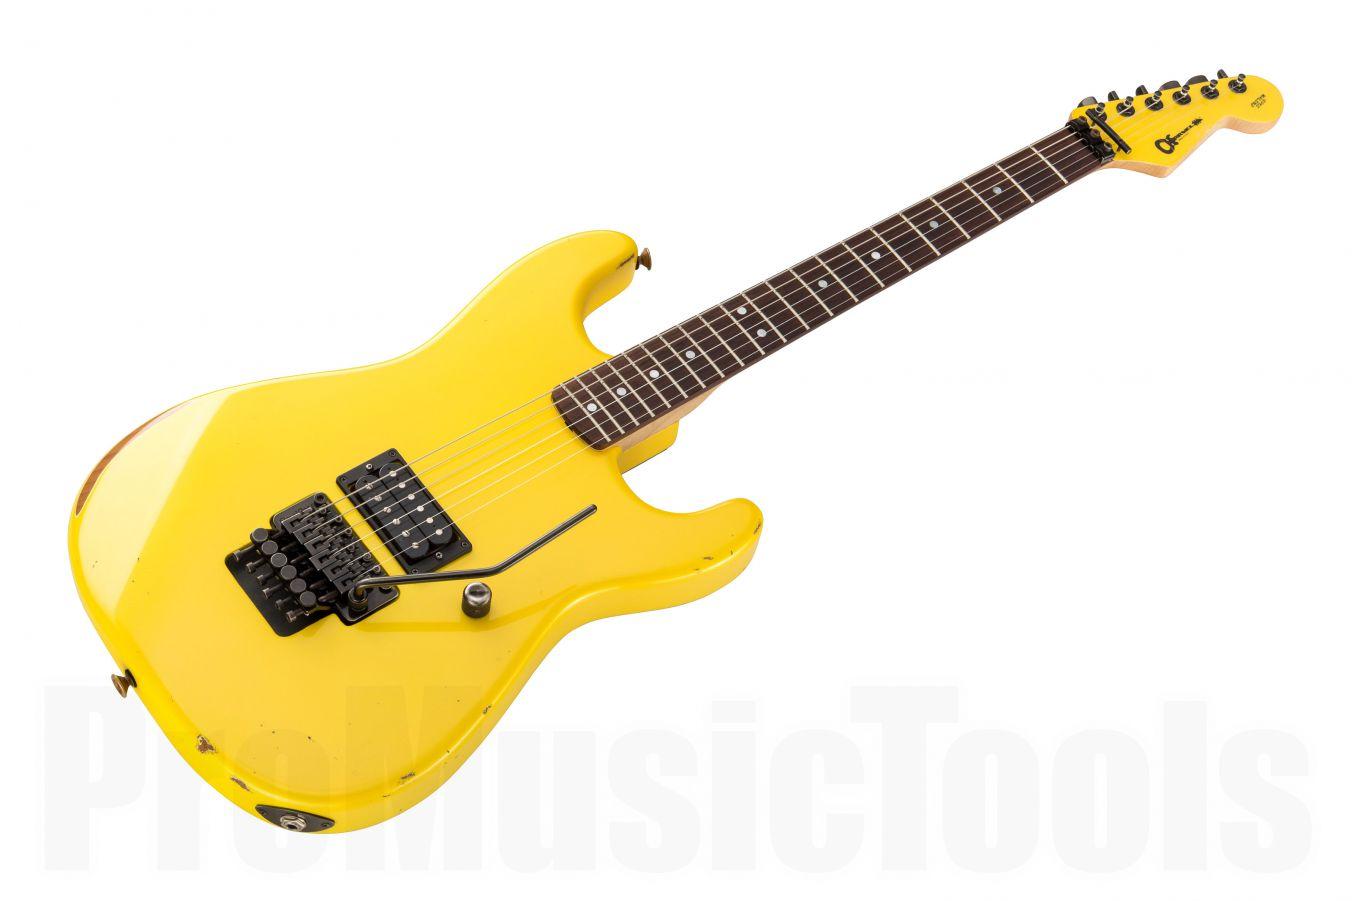 Charvel USA Custom Shop Strat - Aged Yellow Gold Pearl MH